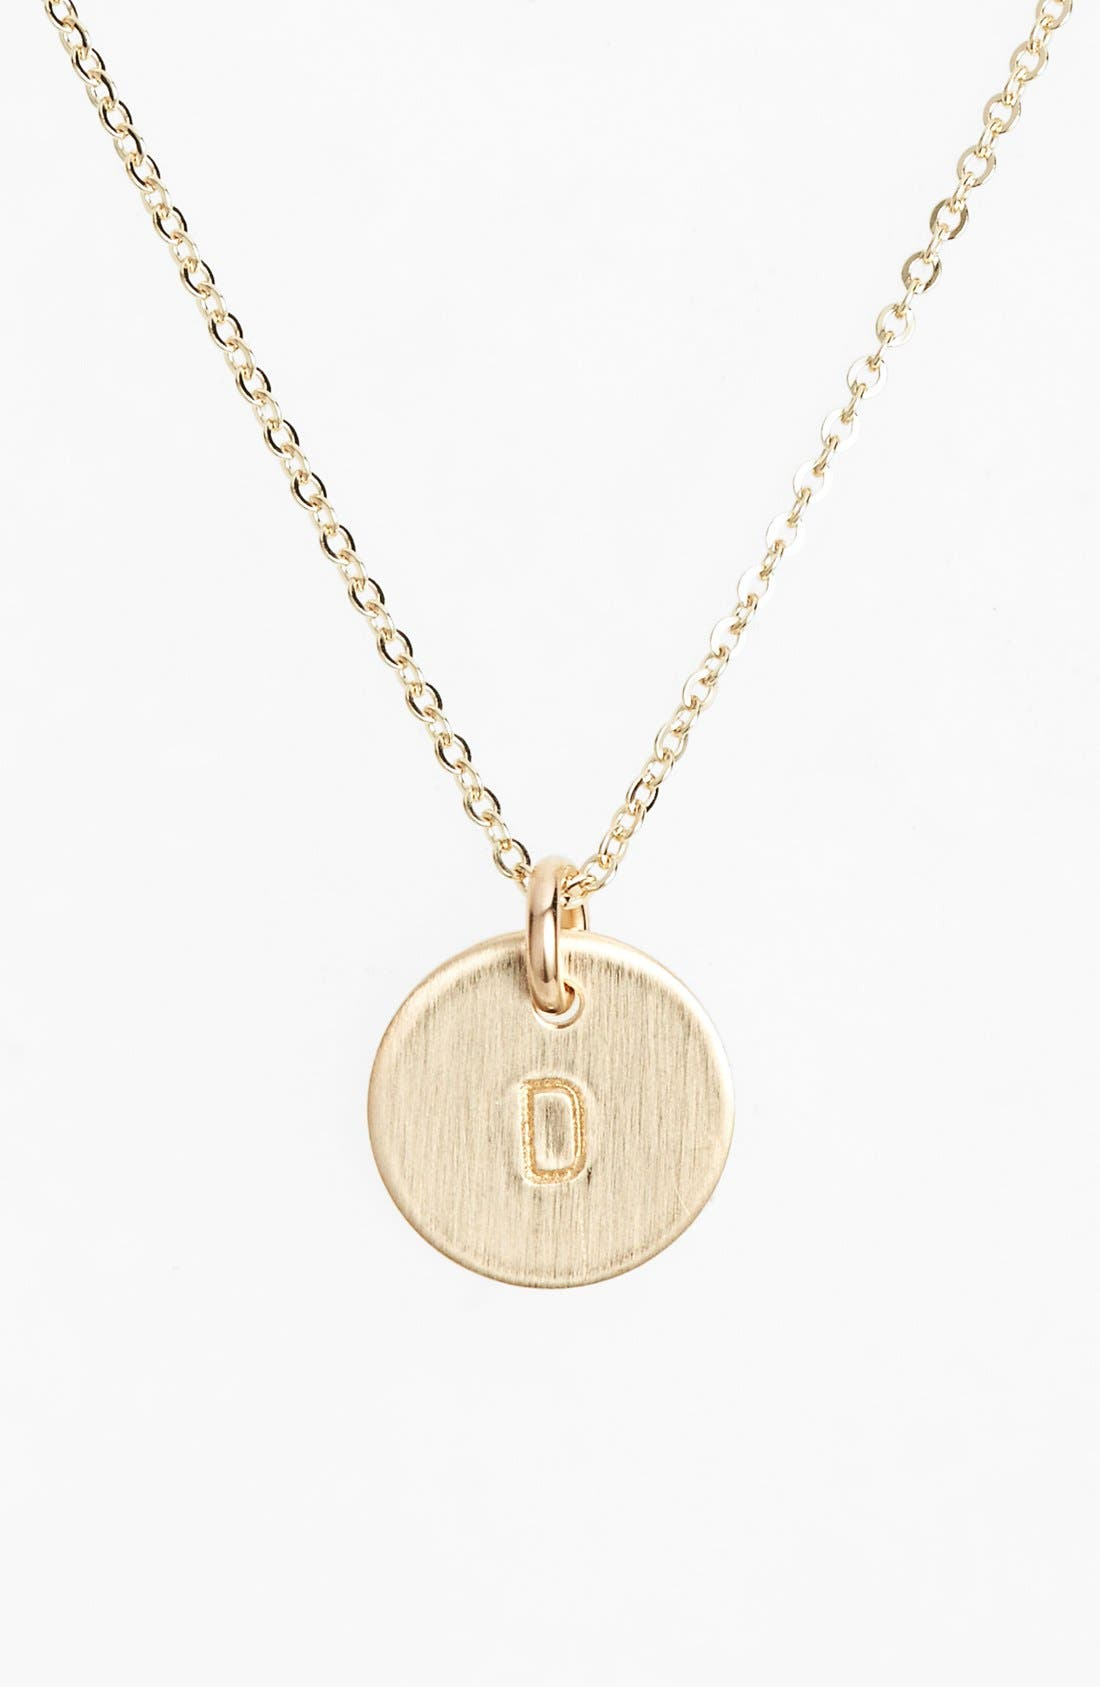 Main Image - Nashelle 14k-Gold Fill Initial Mini Circle Necklace